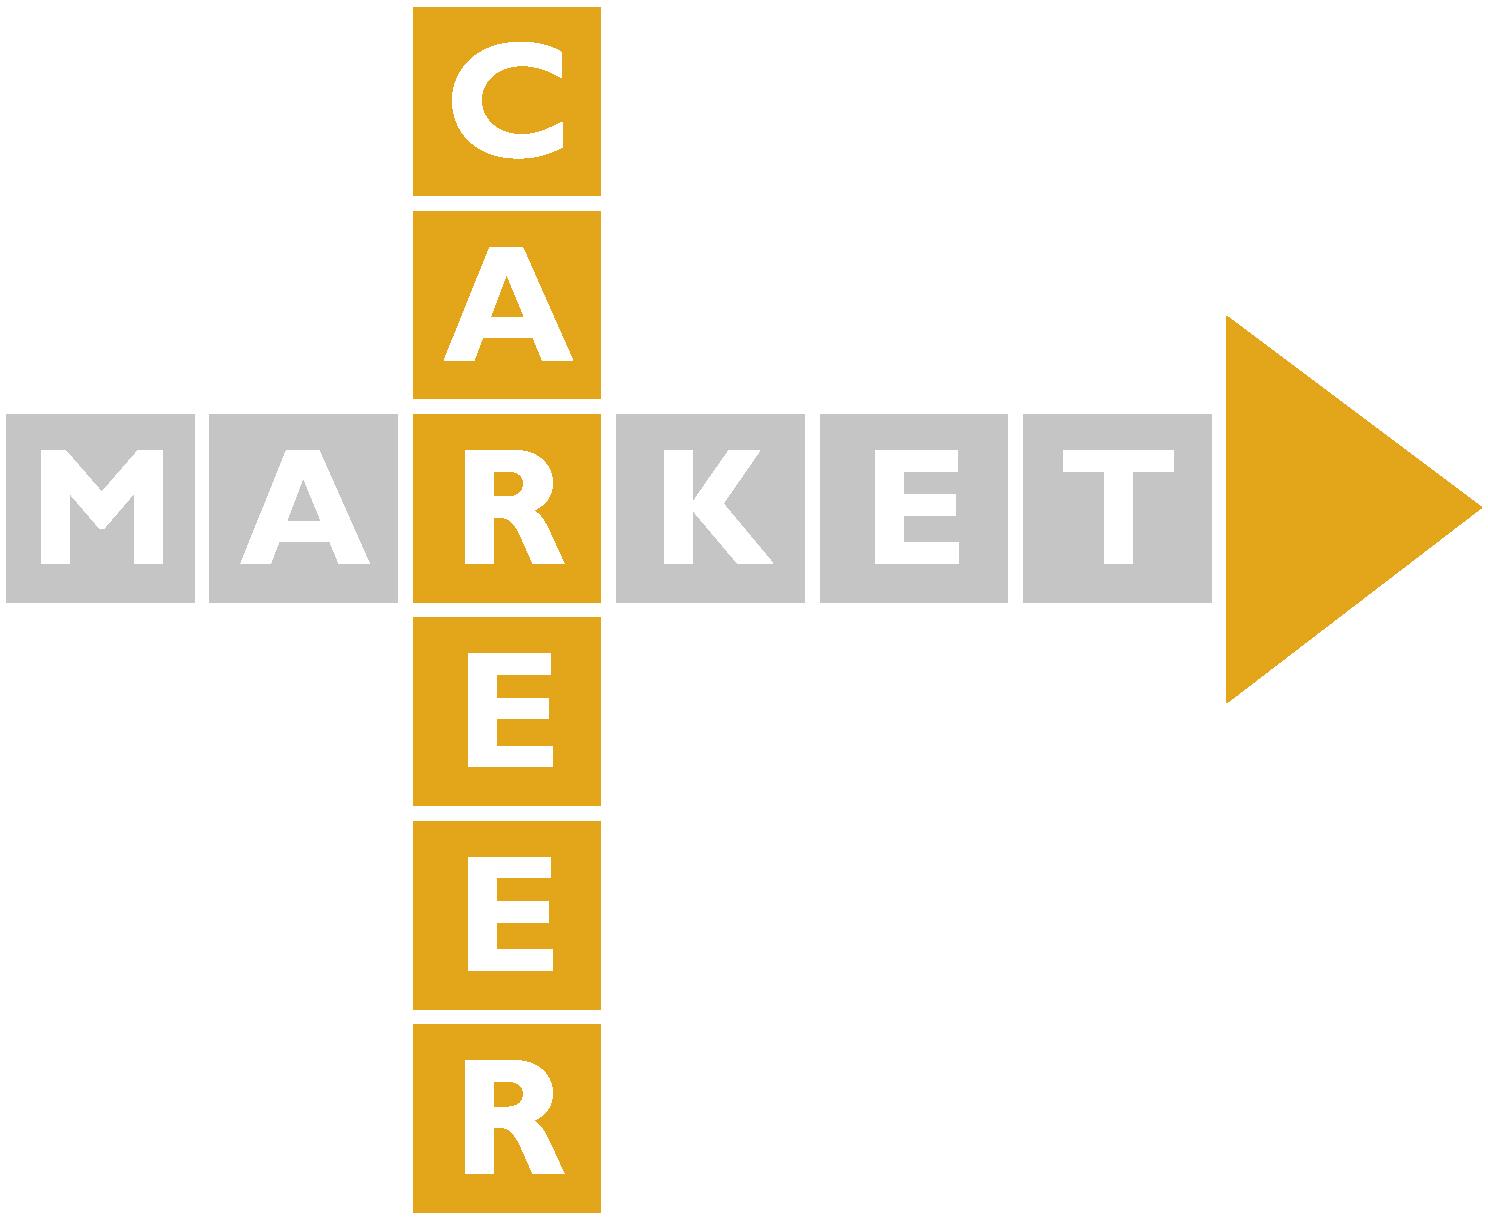 Career_logo_zlute_2018_iCS6-01.jpg